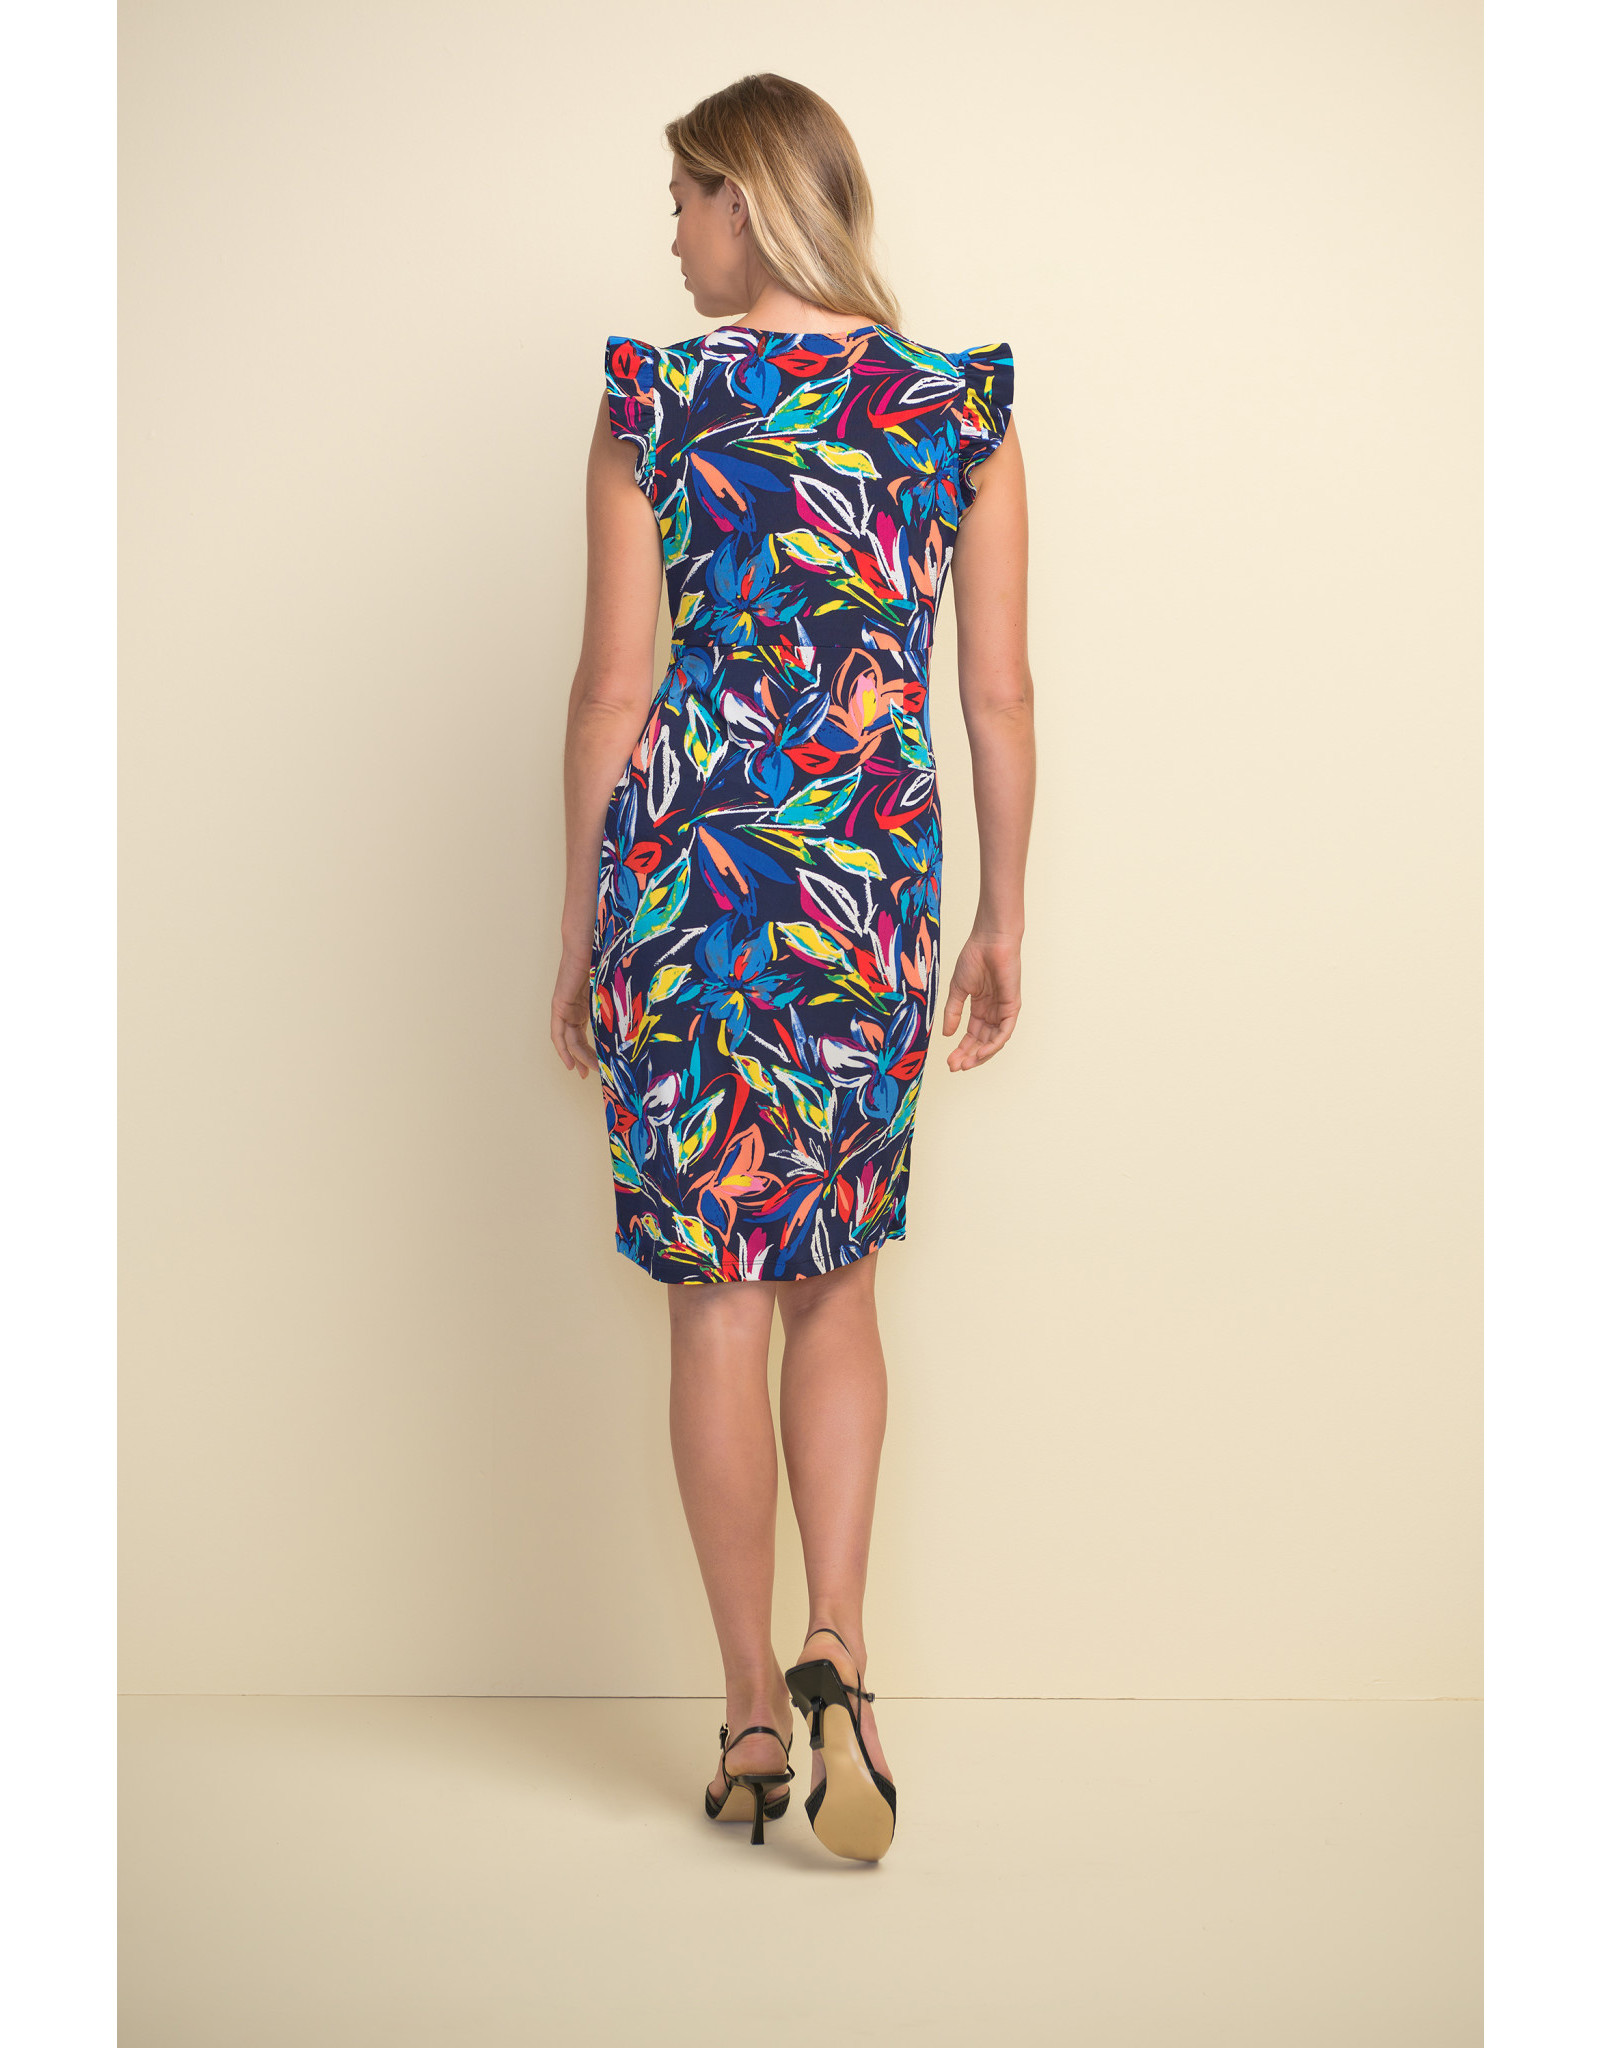 Joseph Ribkoff Printed Dress